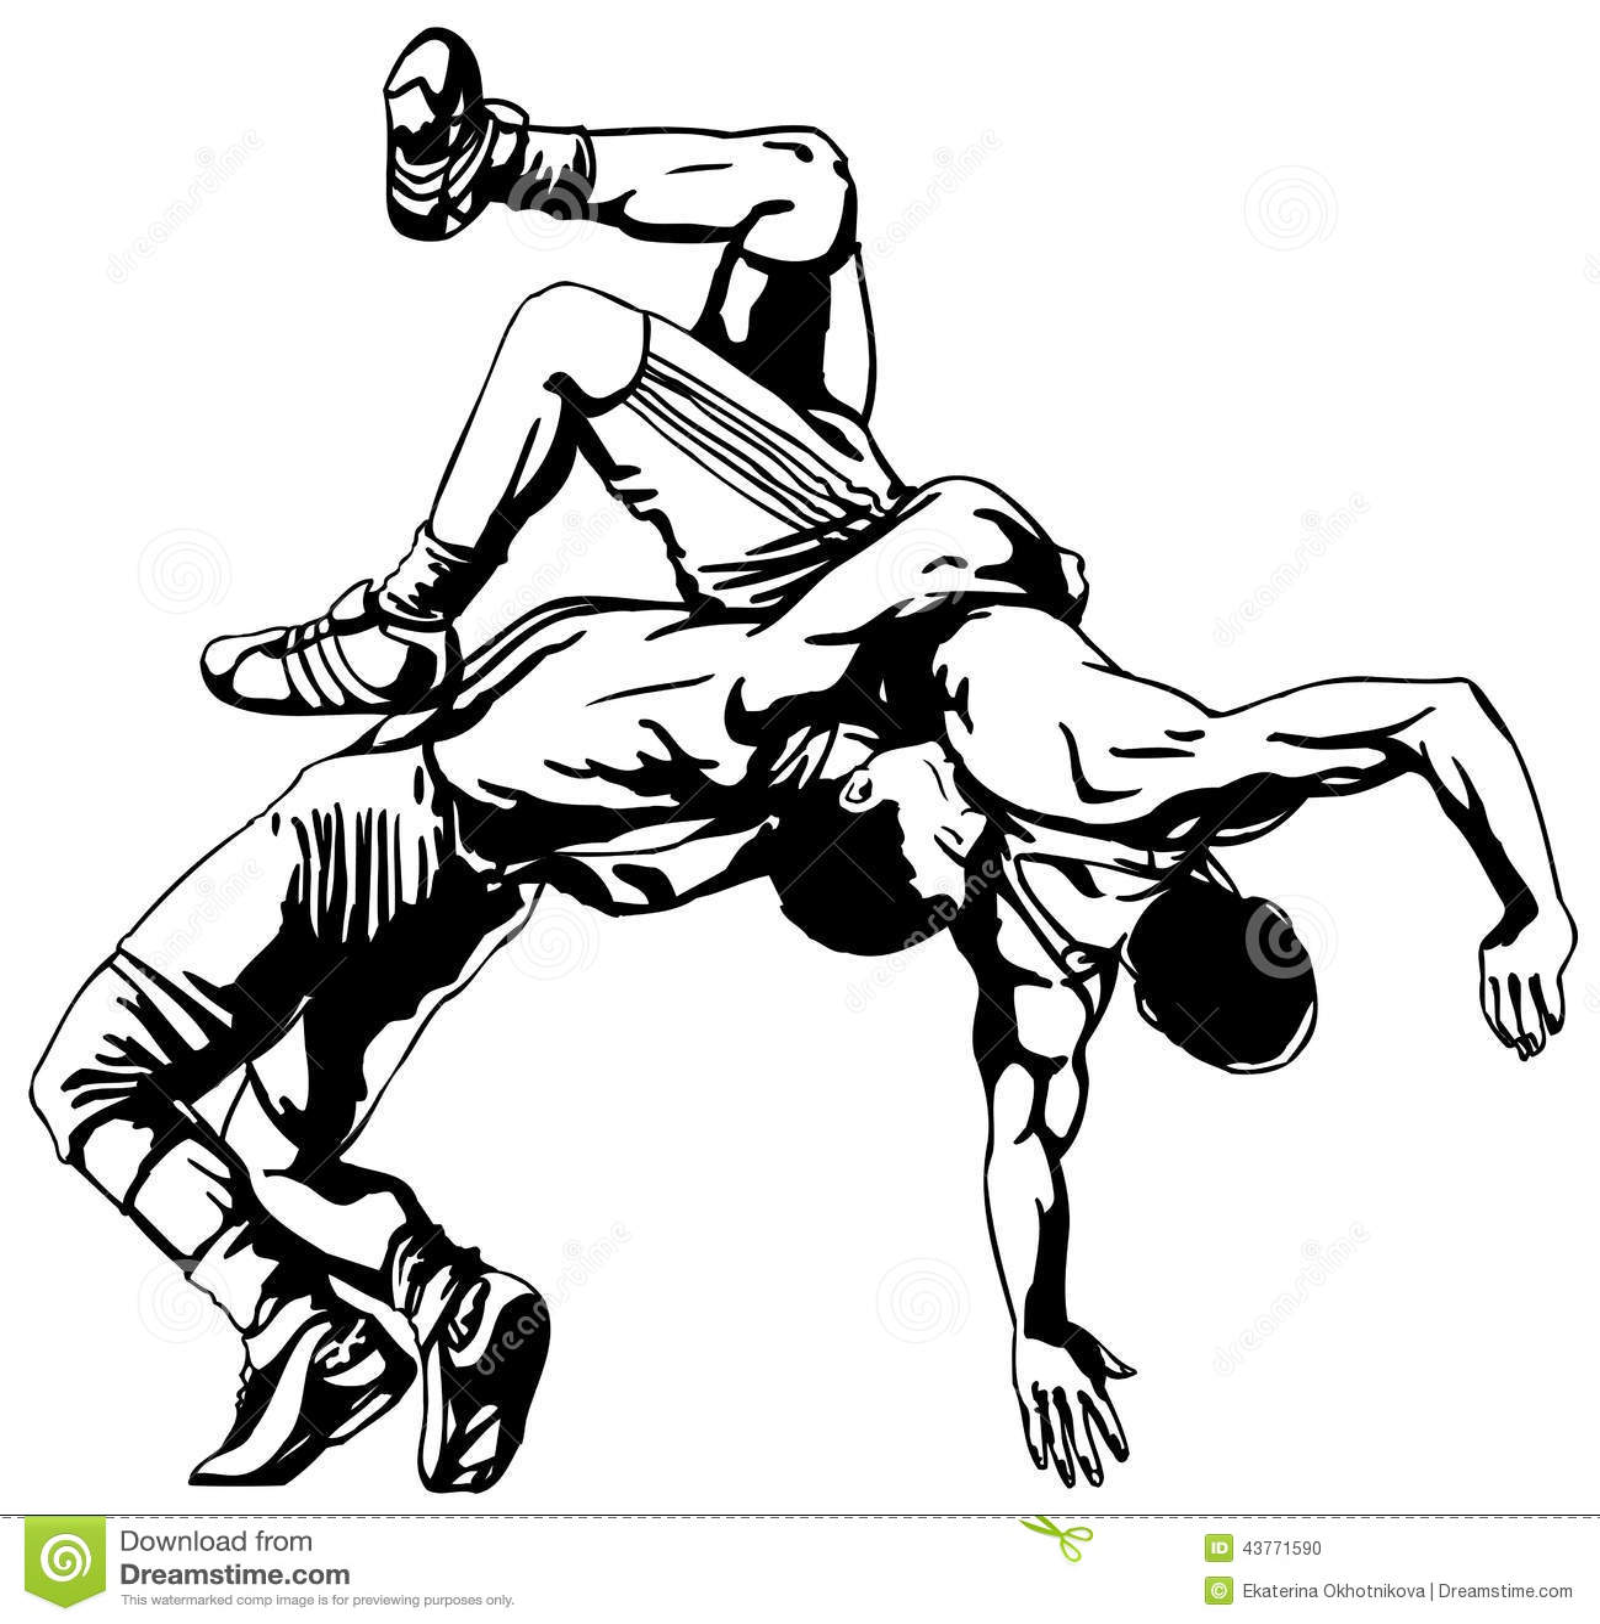 greco roman wrestling stock vector image 43771590 wrestling clipart images wrestling clipart black and white